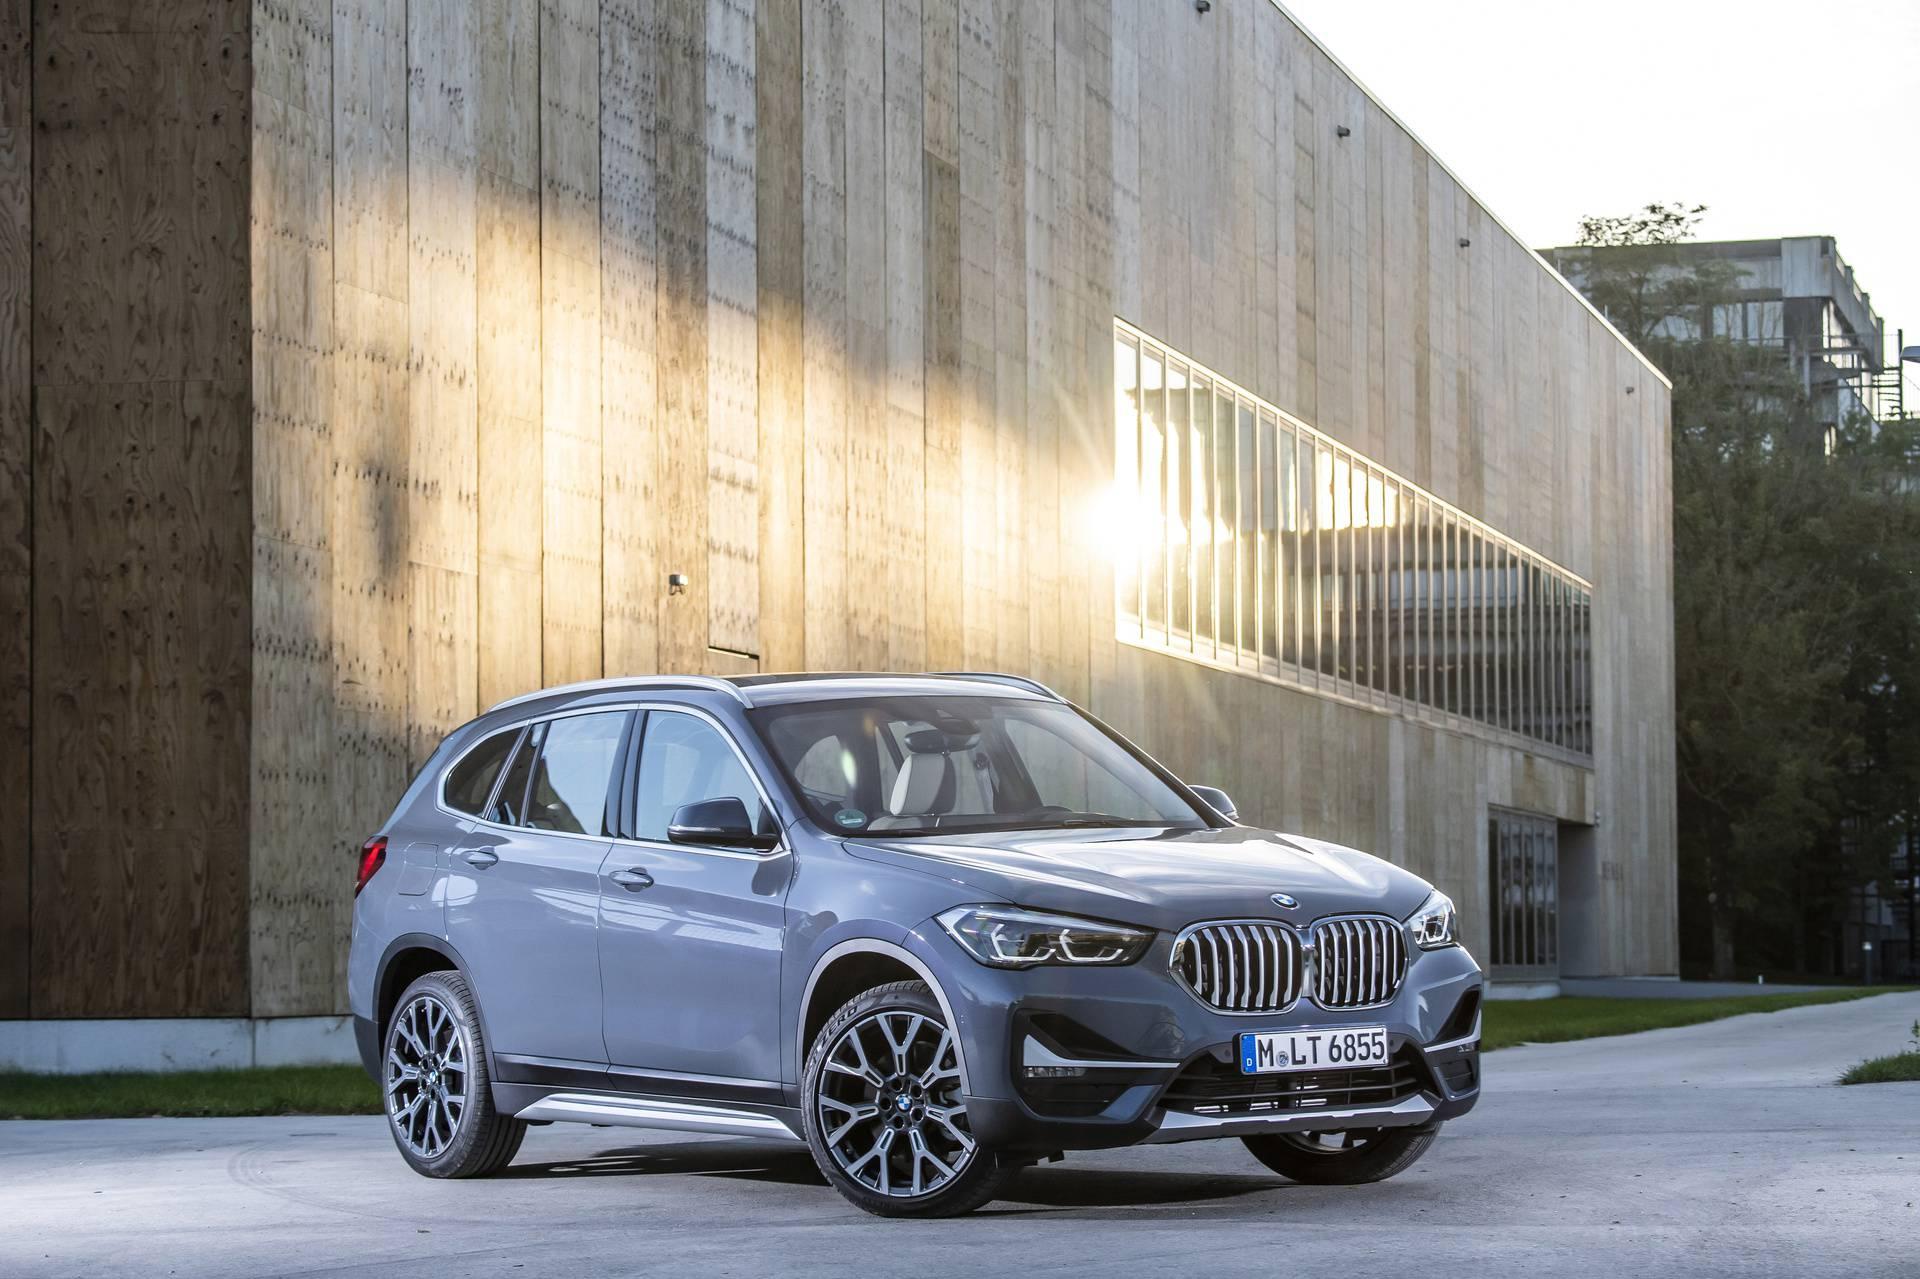 Pravila nagradne igre: Novi BMW X1 može postati vaš